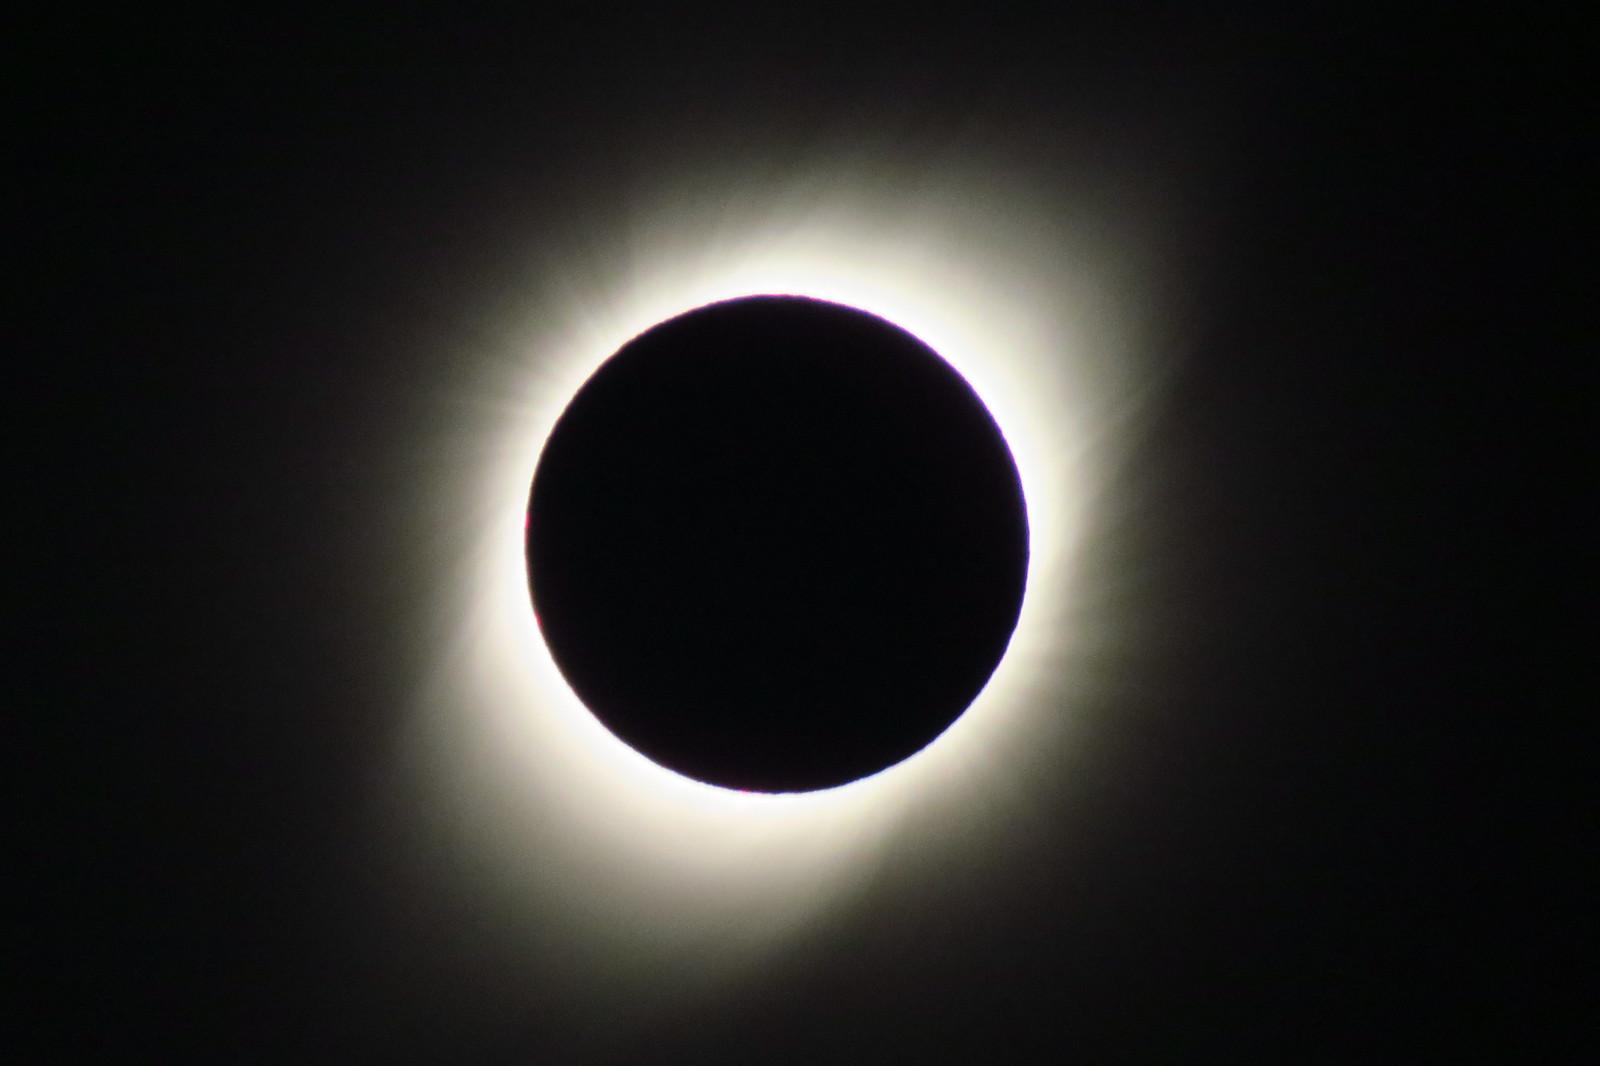 Eclipse in Chile